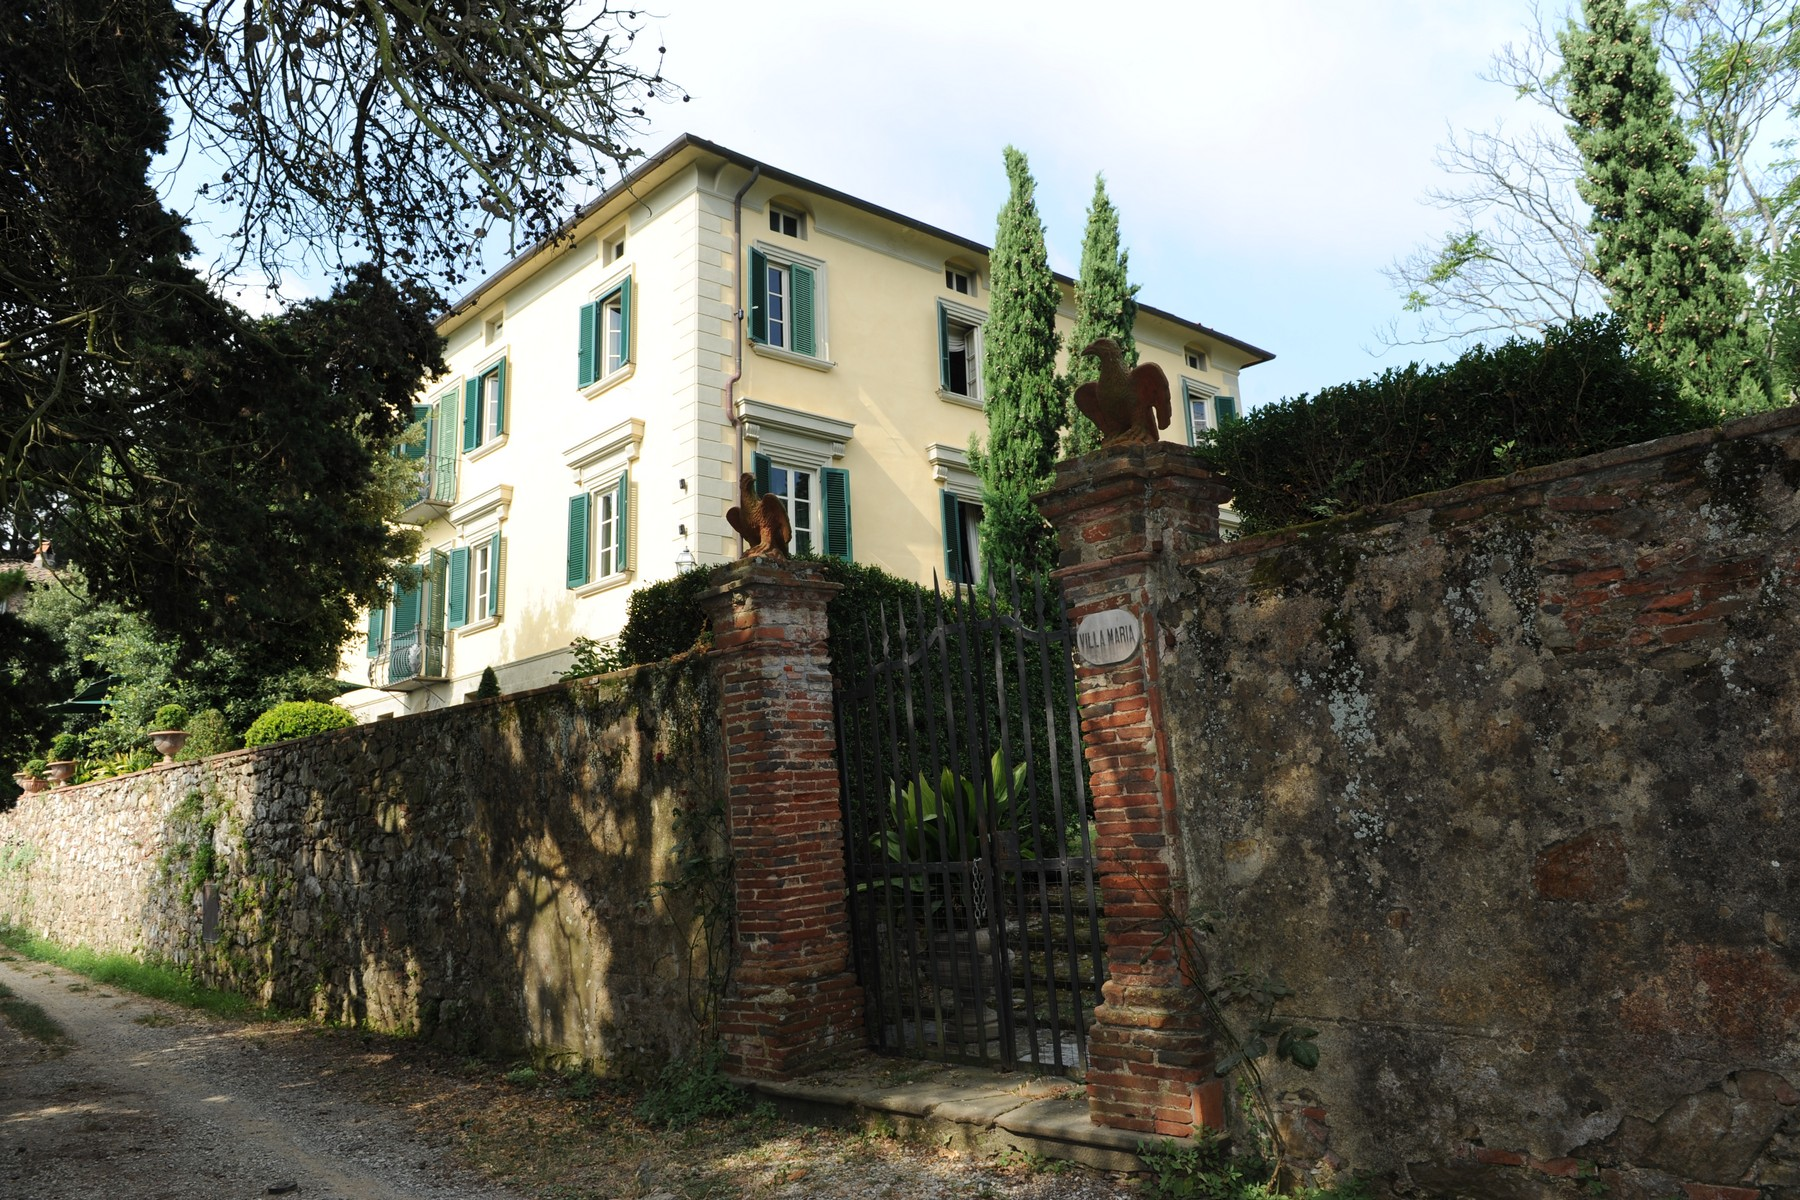 Villa in Vendita a Camaiore: 5 locali, 900 mq - Foto 2